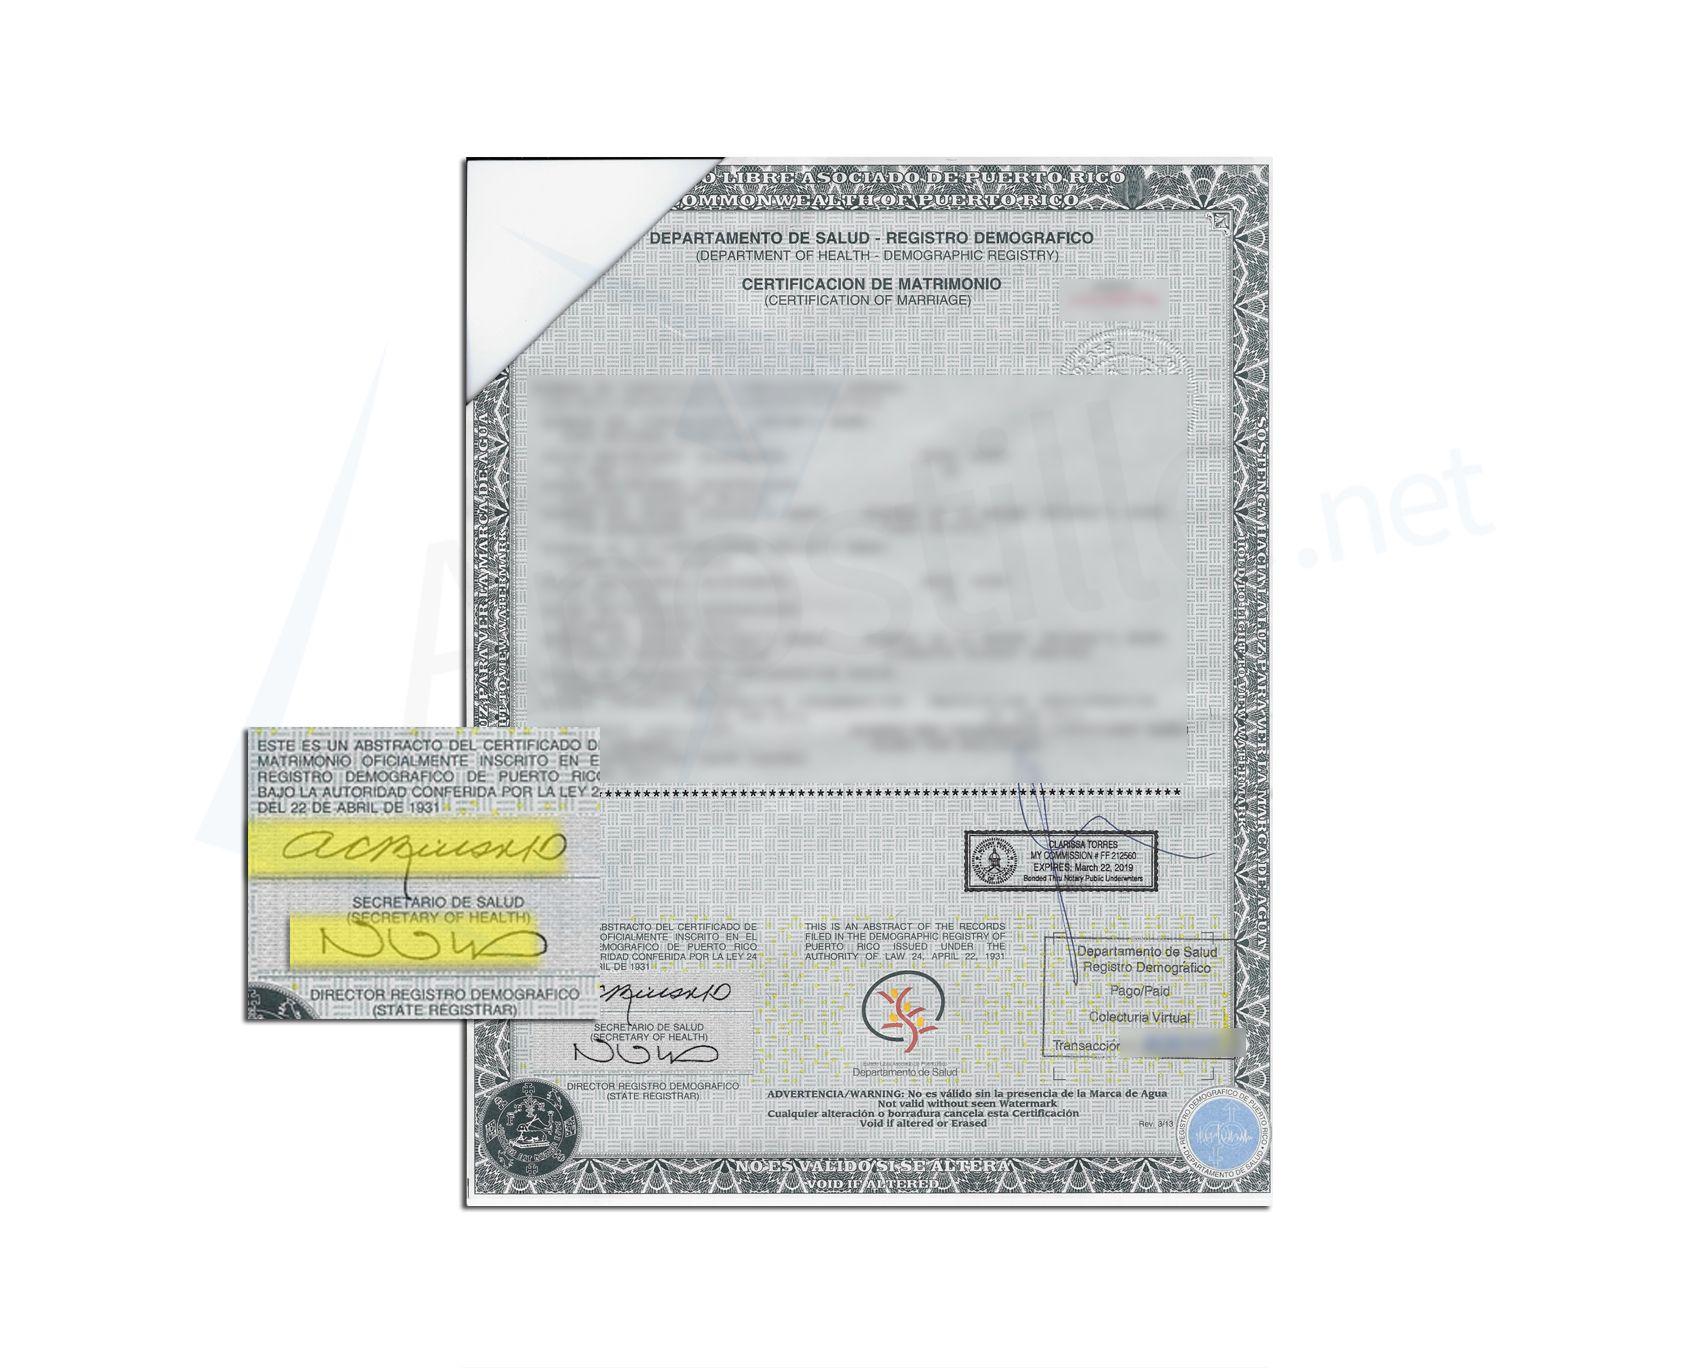 State of puerto rico marriage certificate signed by ana c rius state of puerto rico marriage certificate signed by ana c rius armendris and nancy veta ramos xflitez Images